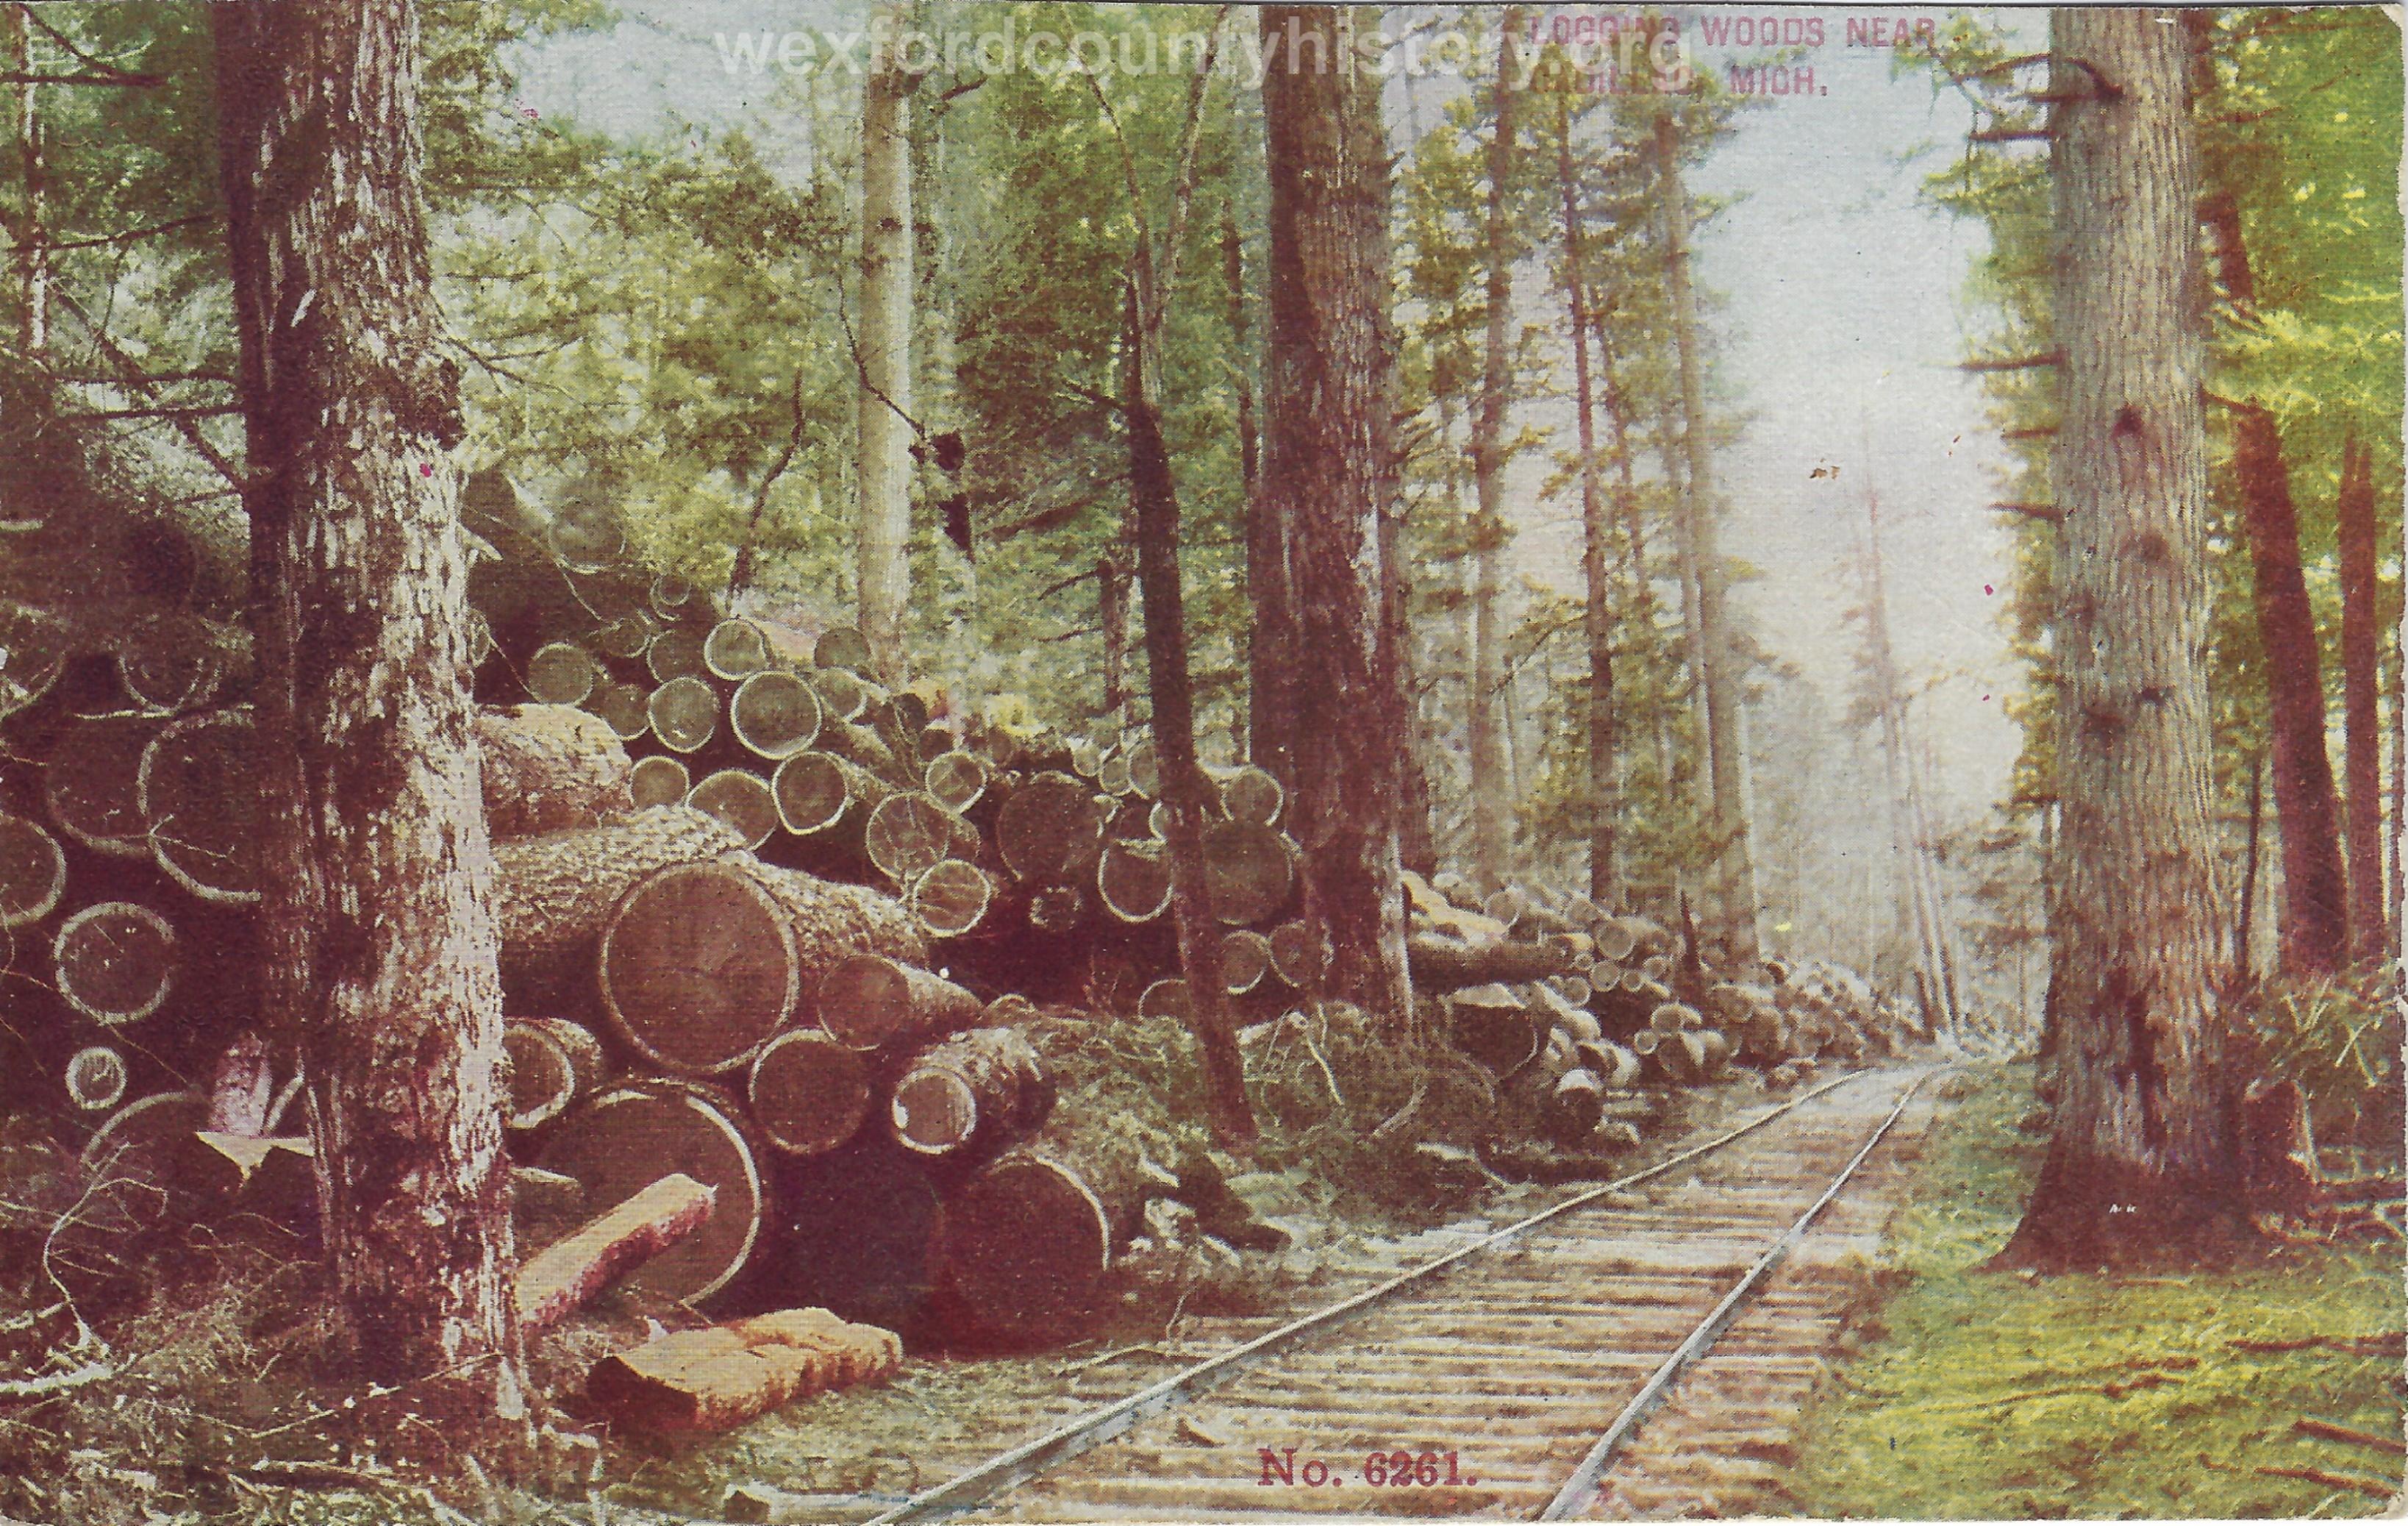 Cadillac-Lumber-Logging-Woods-Near-Cadillac-Michigan